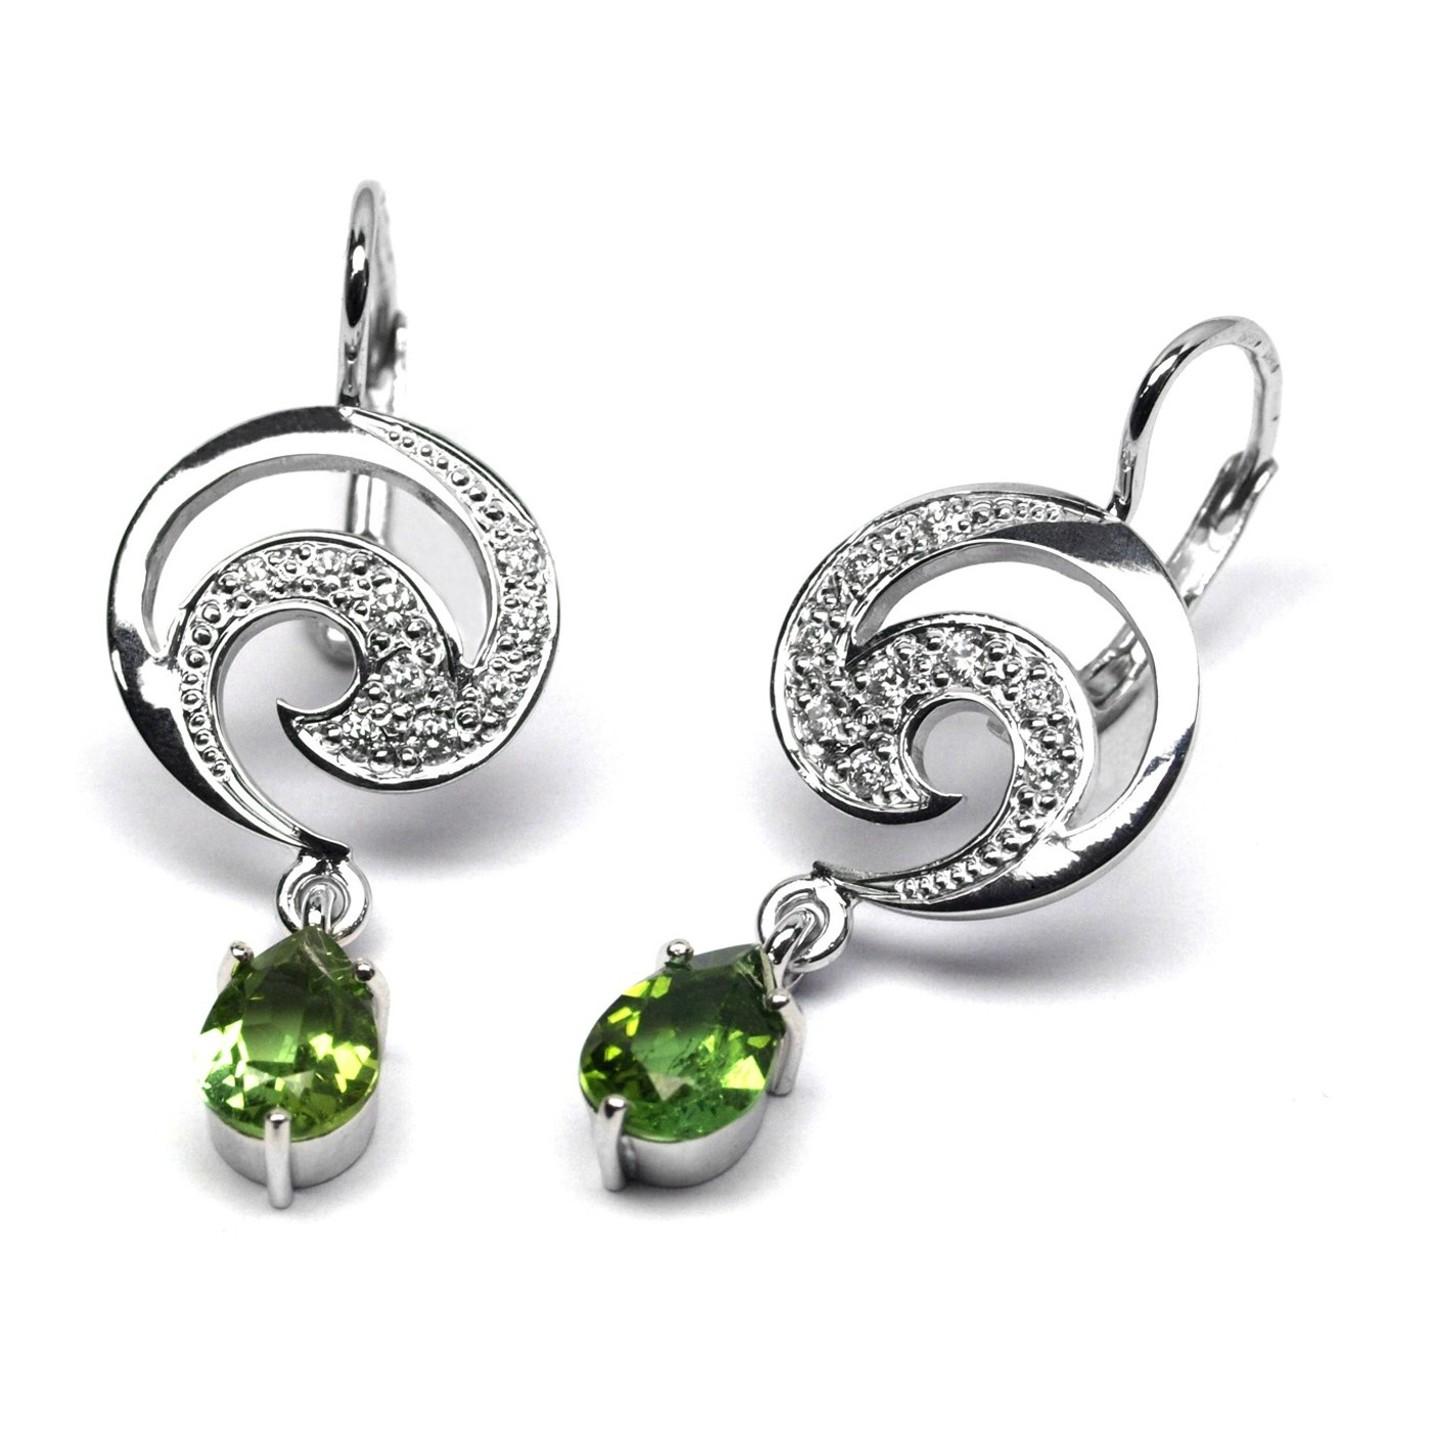 Diamantové zlaté náušnice s turmalíny a diamanty J-28496-17